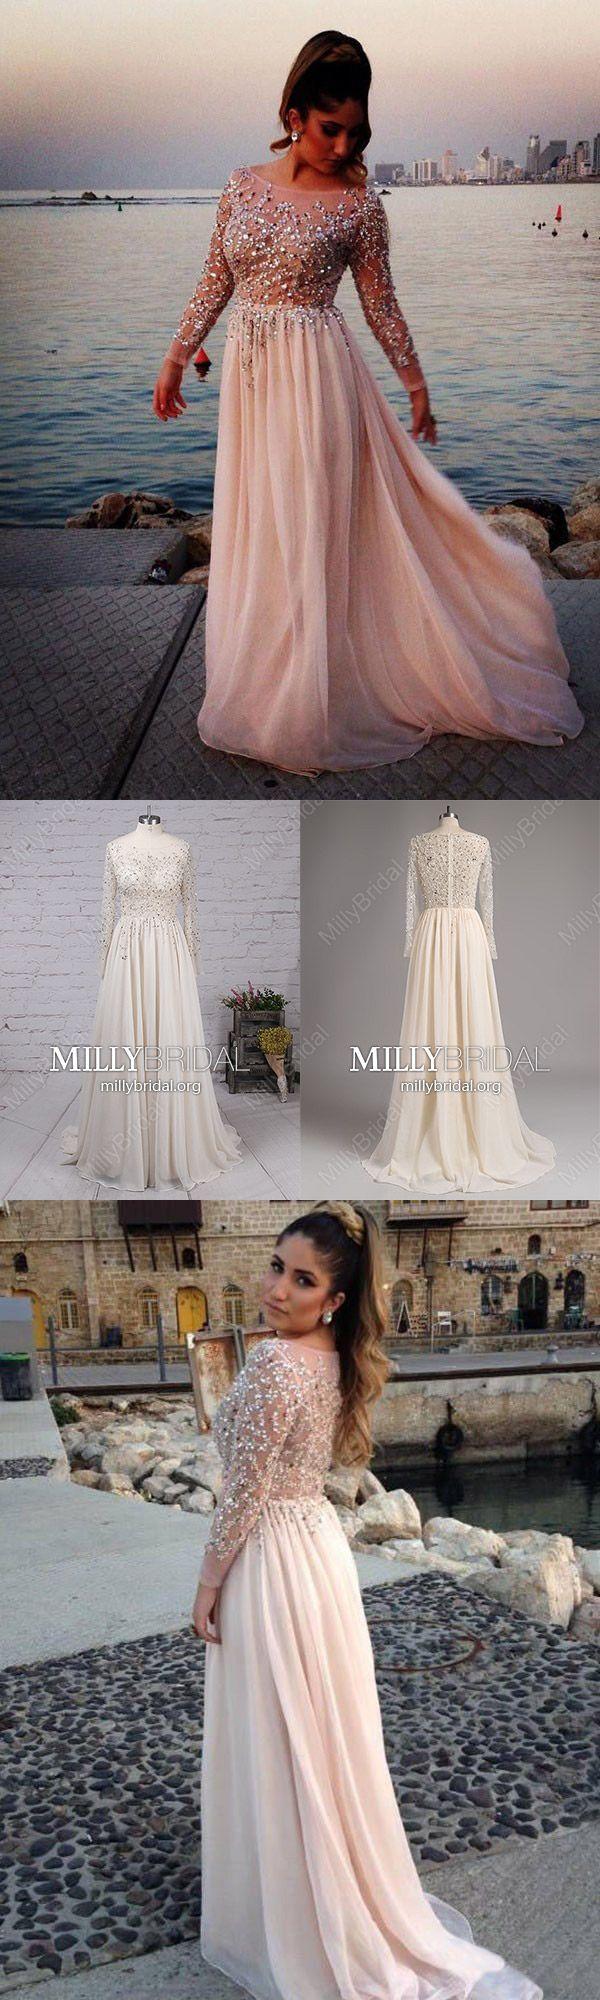 Long prom dresses for teenssparkly formal evening dresses pinklong